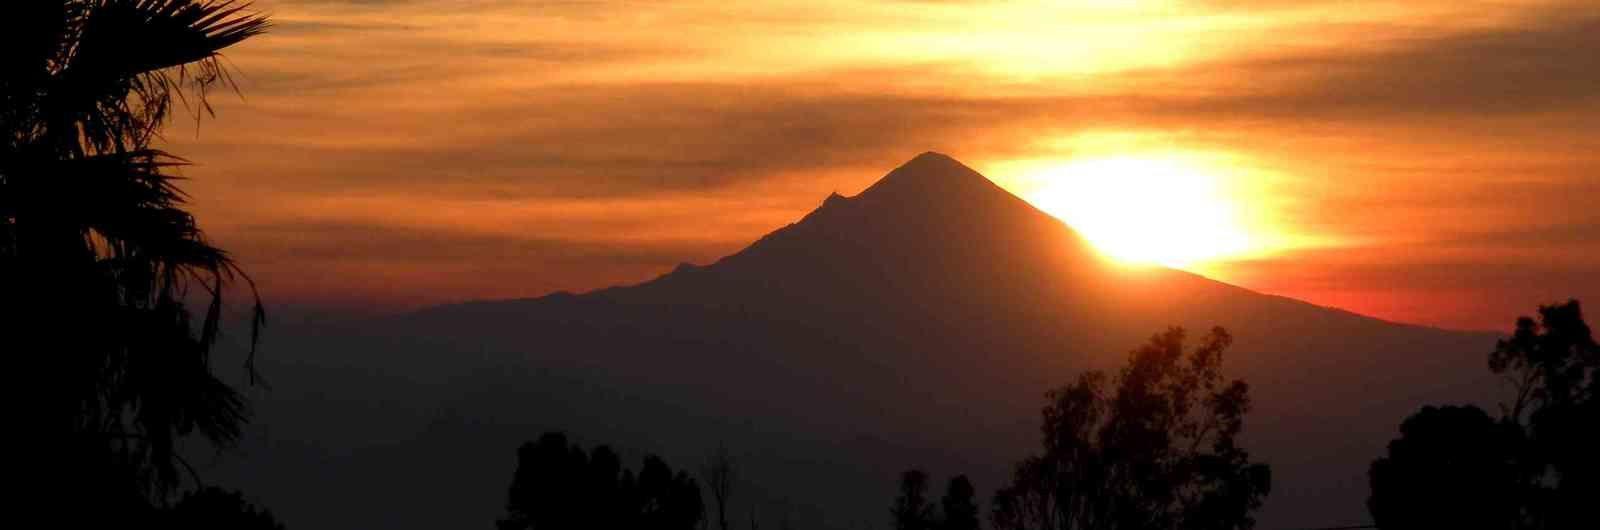 Les phénomènes du Popocatepetl